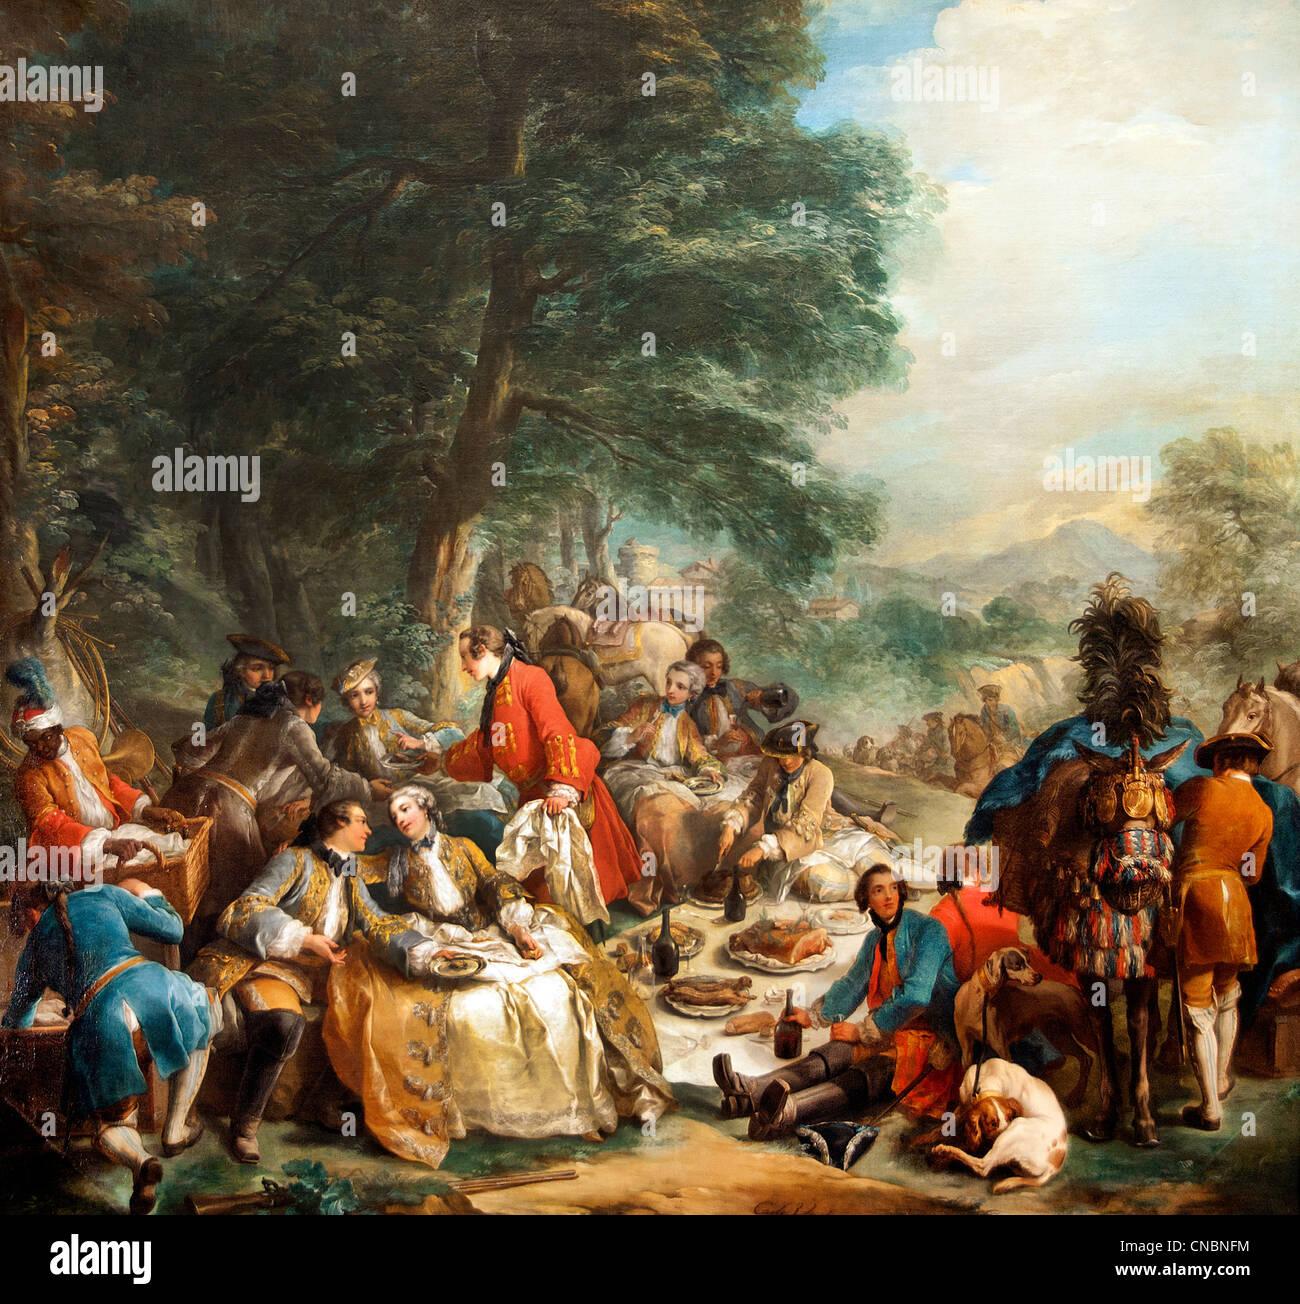 Charles André dit Carle Vanloo - Halte de chasse  Charles-André Carle Vanloo - Stop Hunting 1737 France - Stock Image